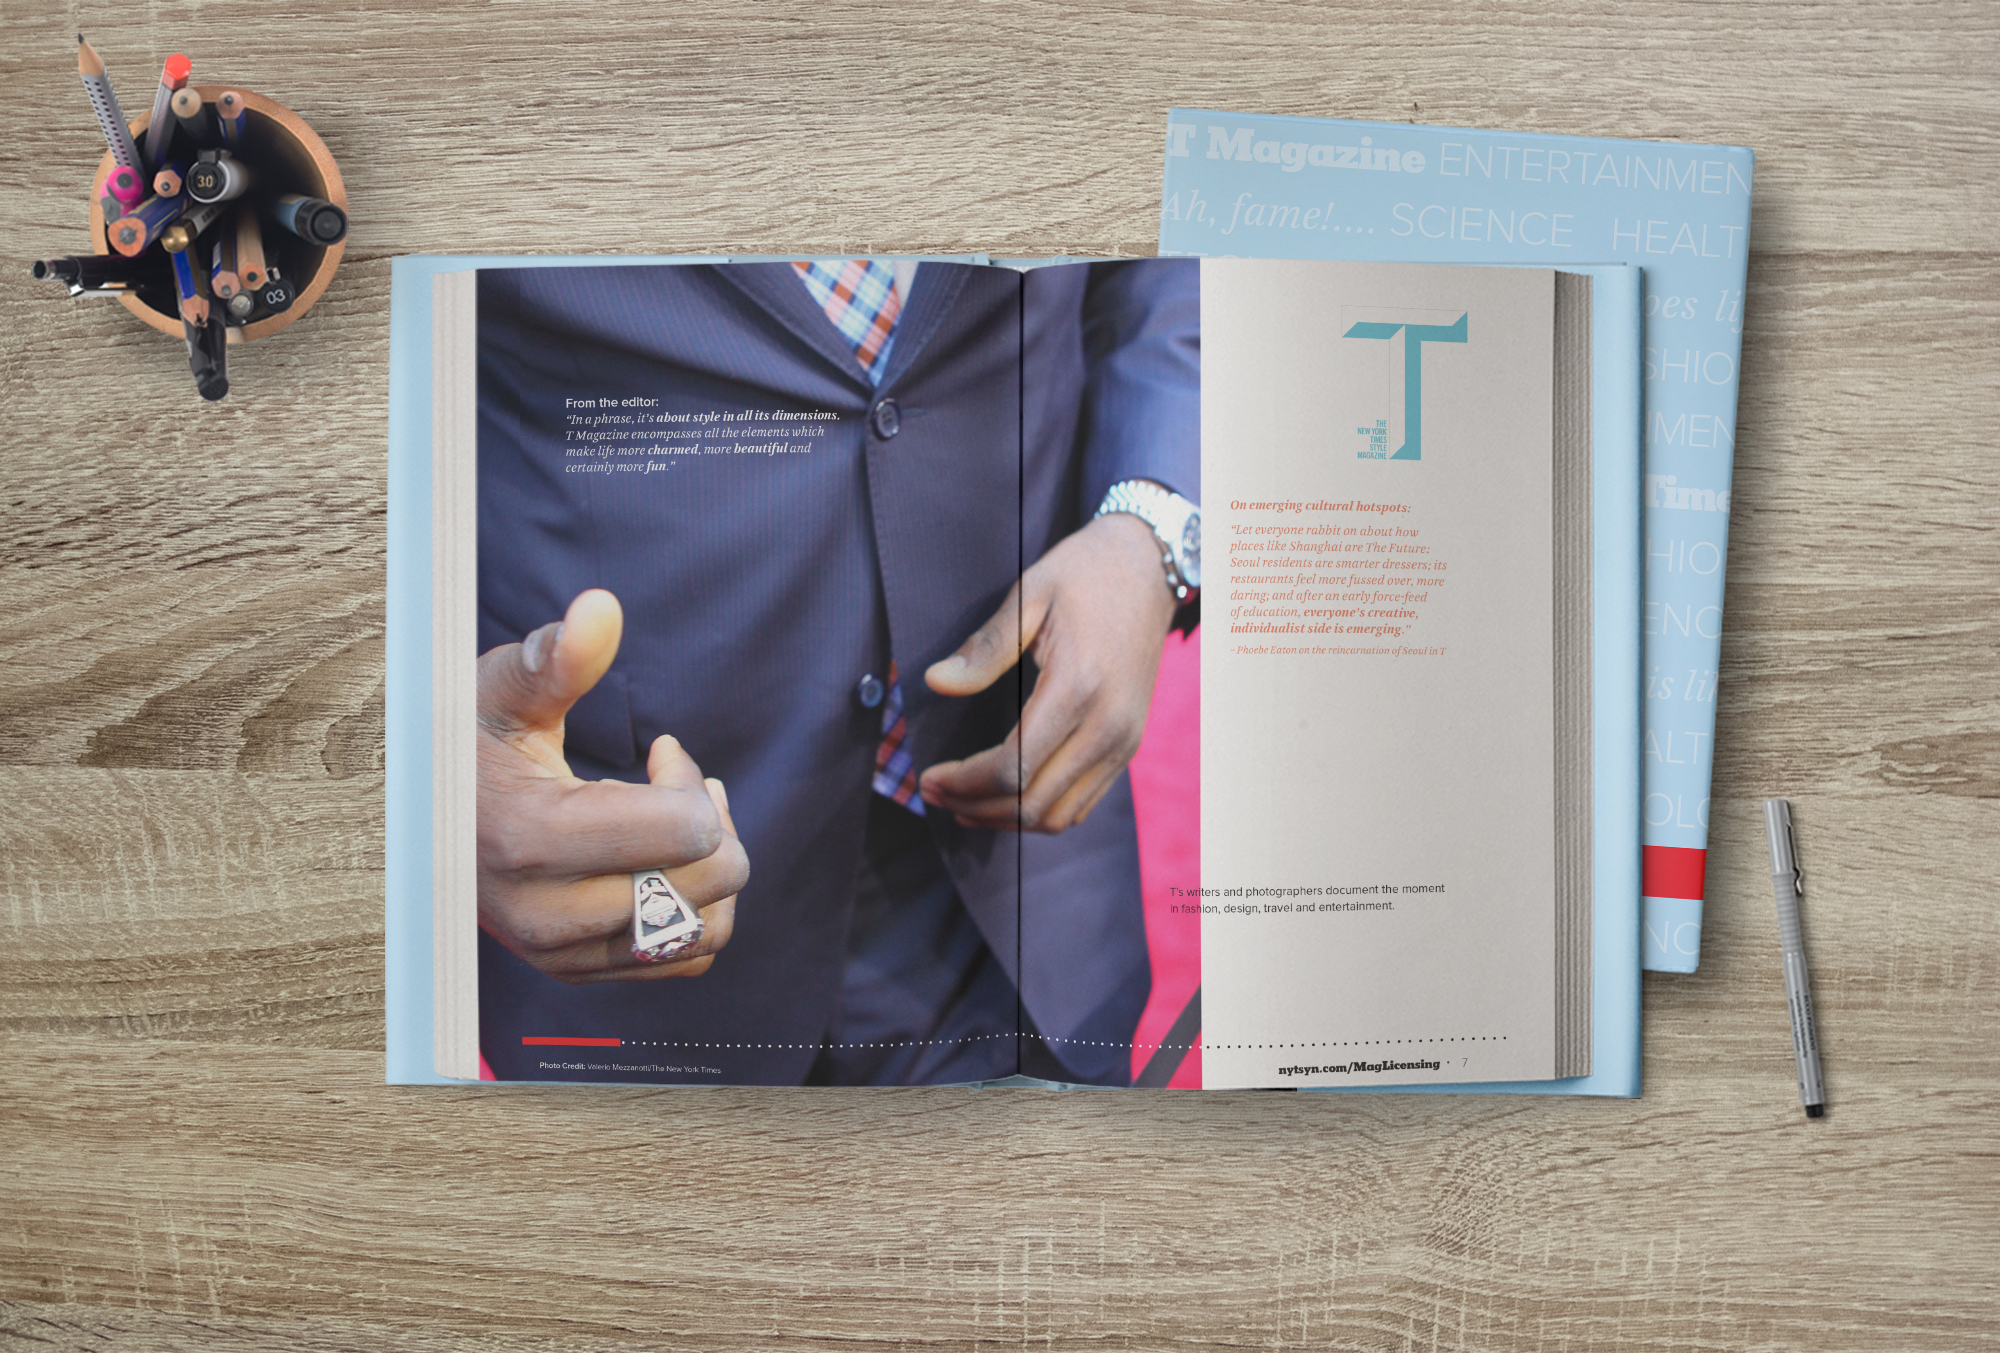 candelita-nytsyn-licensing-magazine-booklet